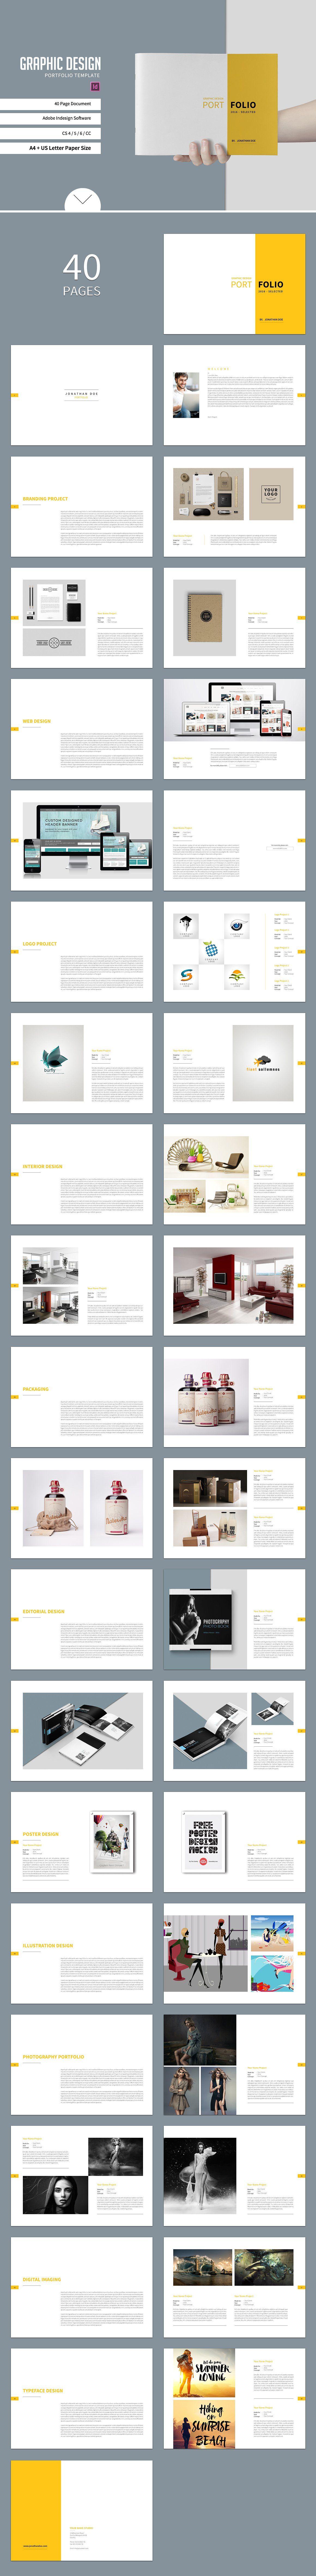 Company Portfolio Template Fair Graphic Design Portfolio Templatetujuhbenua On Creativemarket .